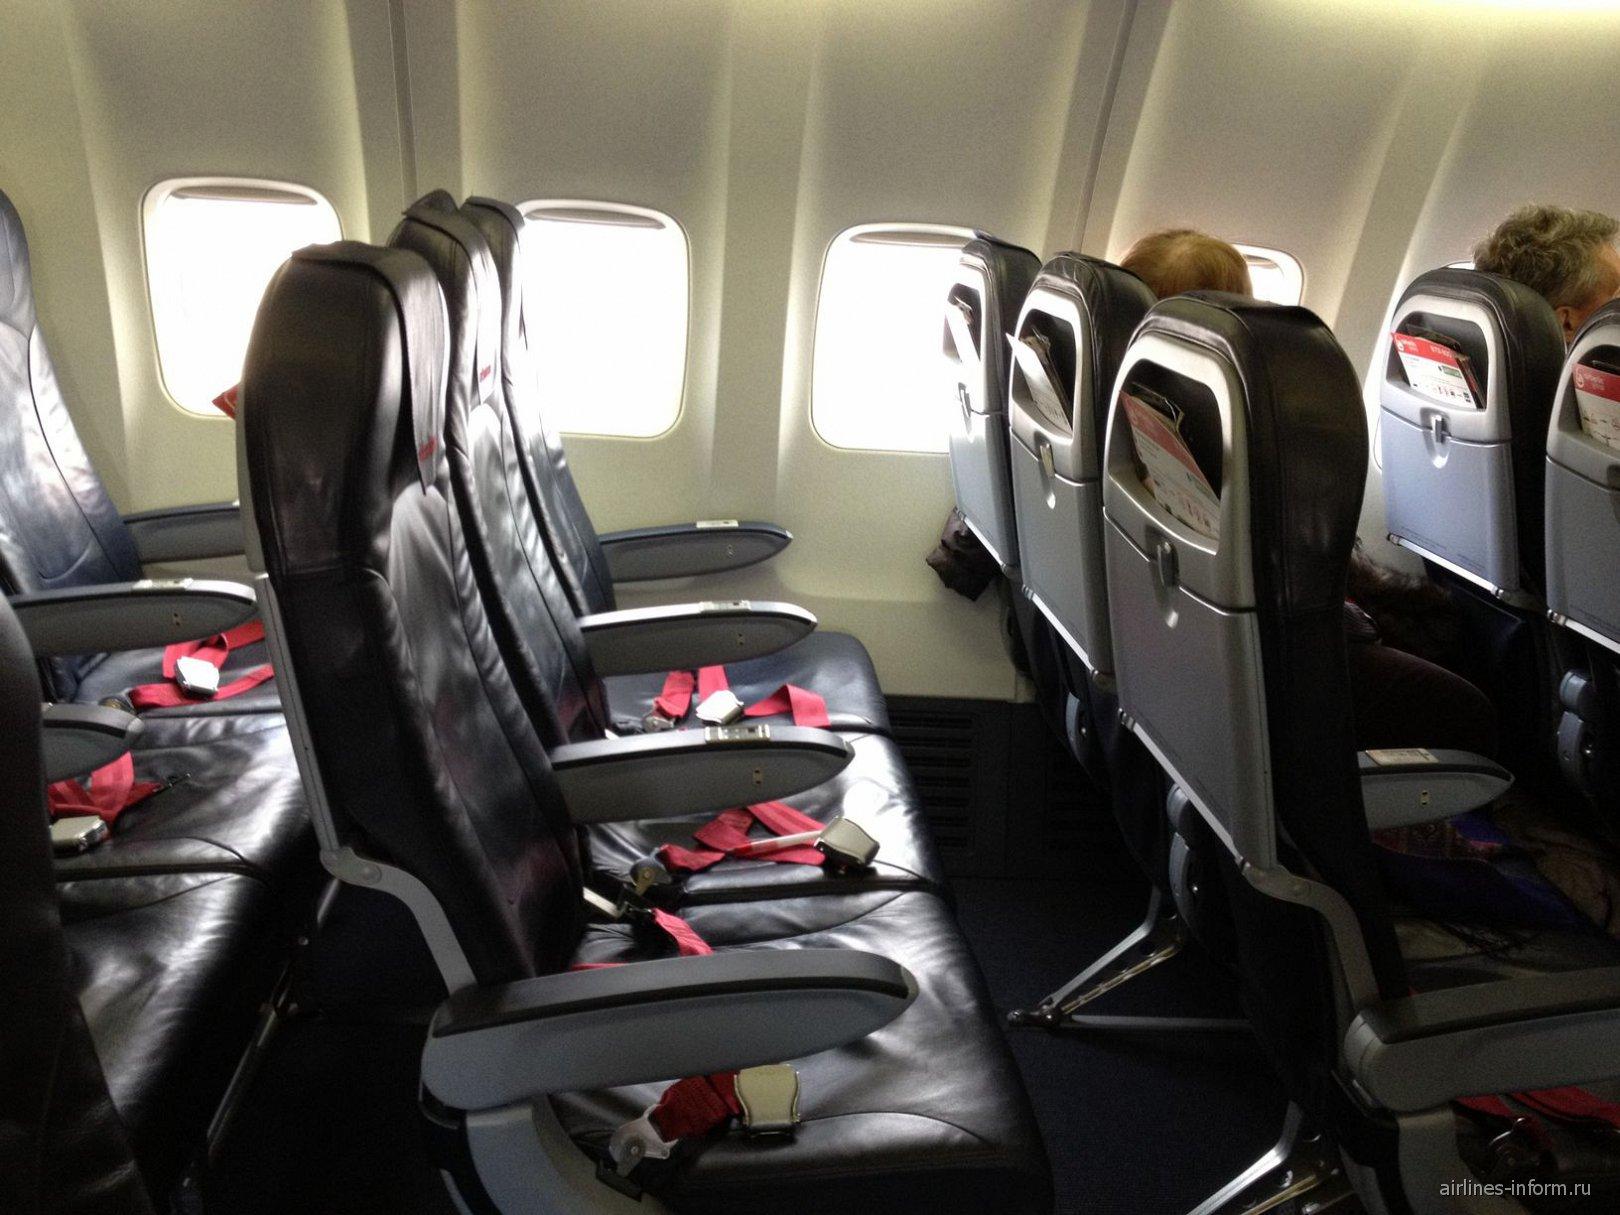 Кресла в самолете Боинг-737-800 авиакомпании airberlin